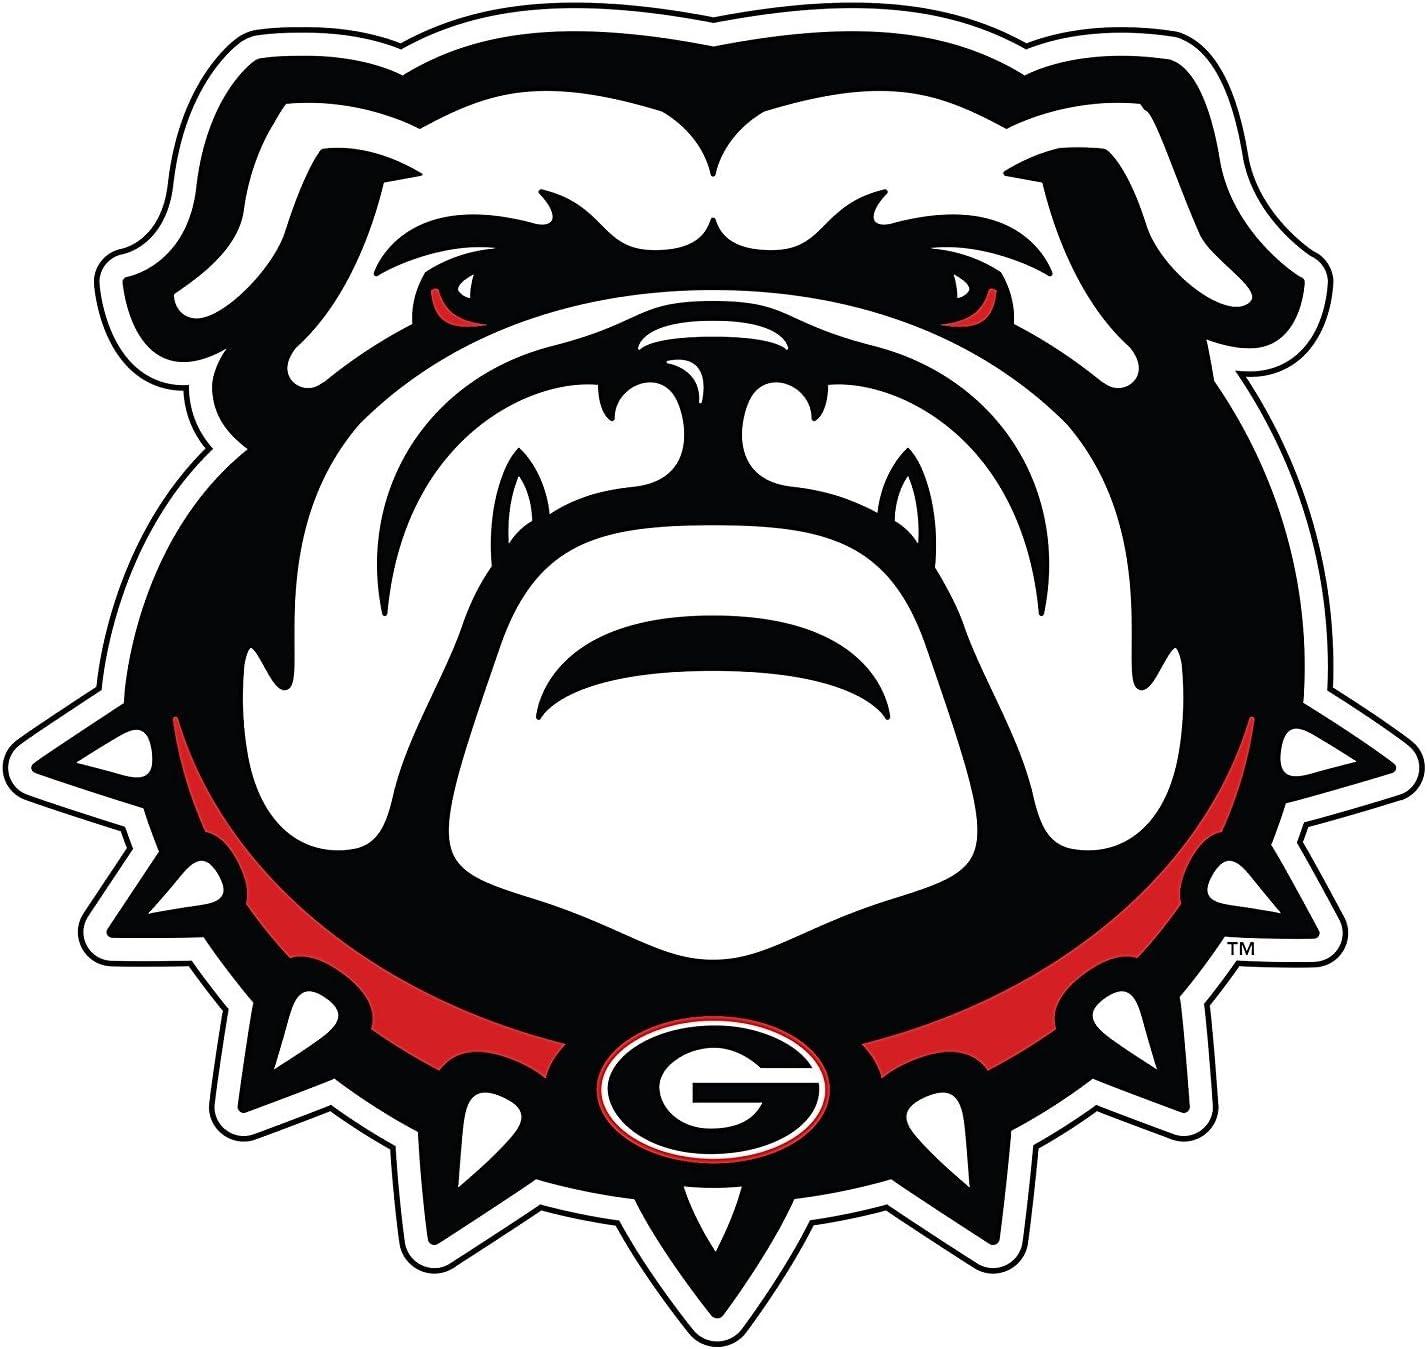 georgia bulldogs state shape logo with heart vinyl decal